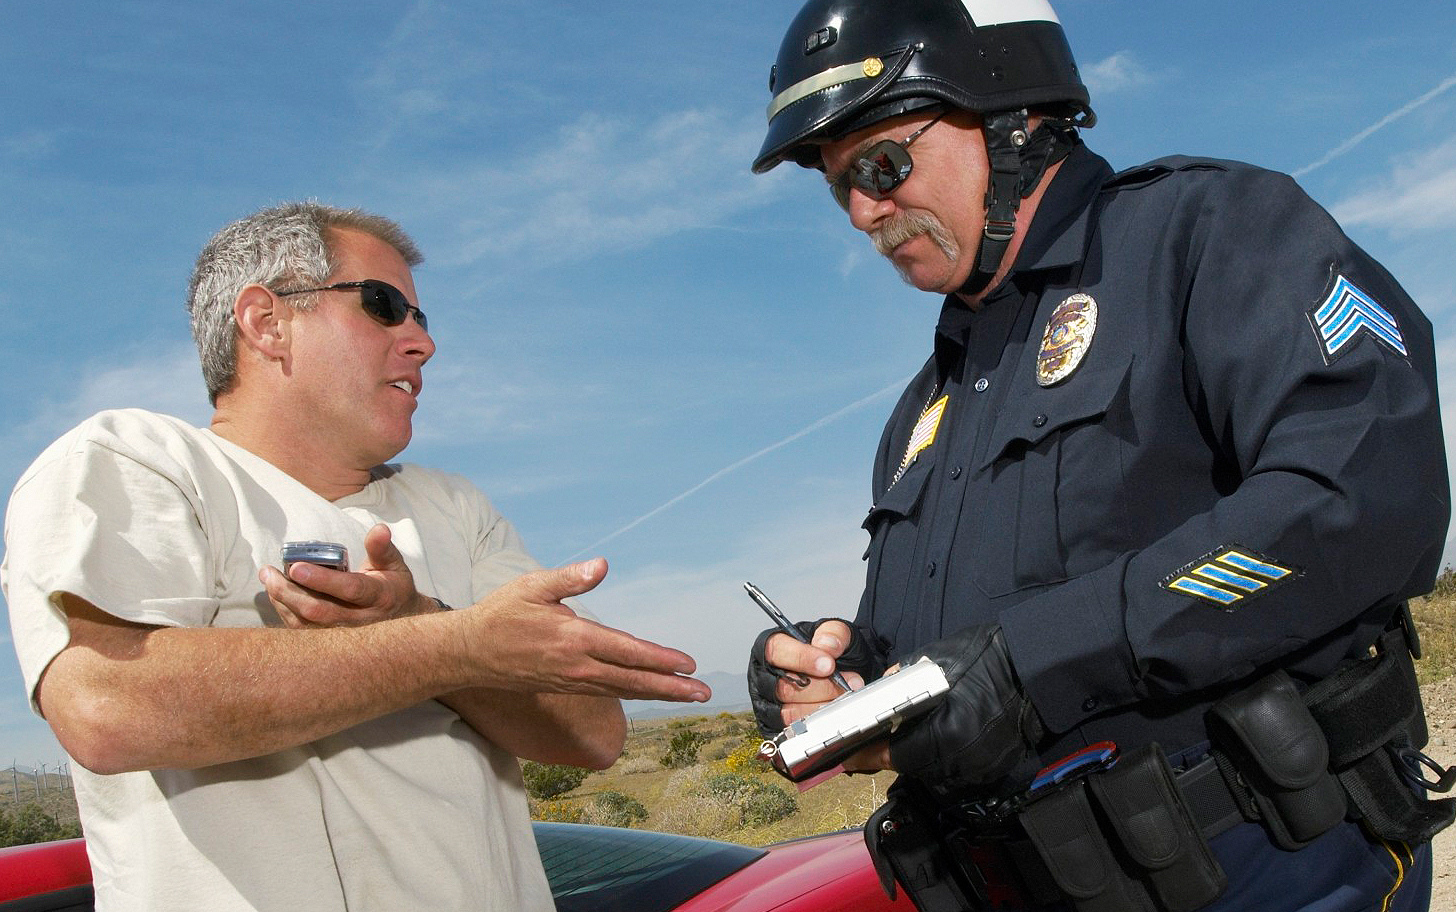 motor cop with motorist.jpg